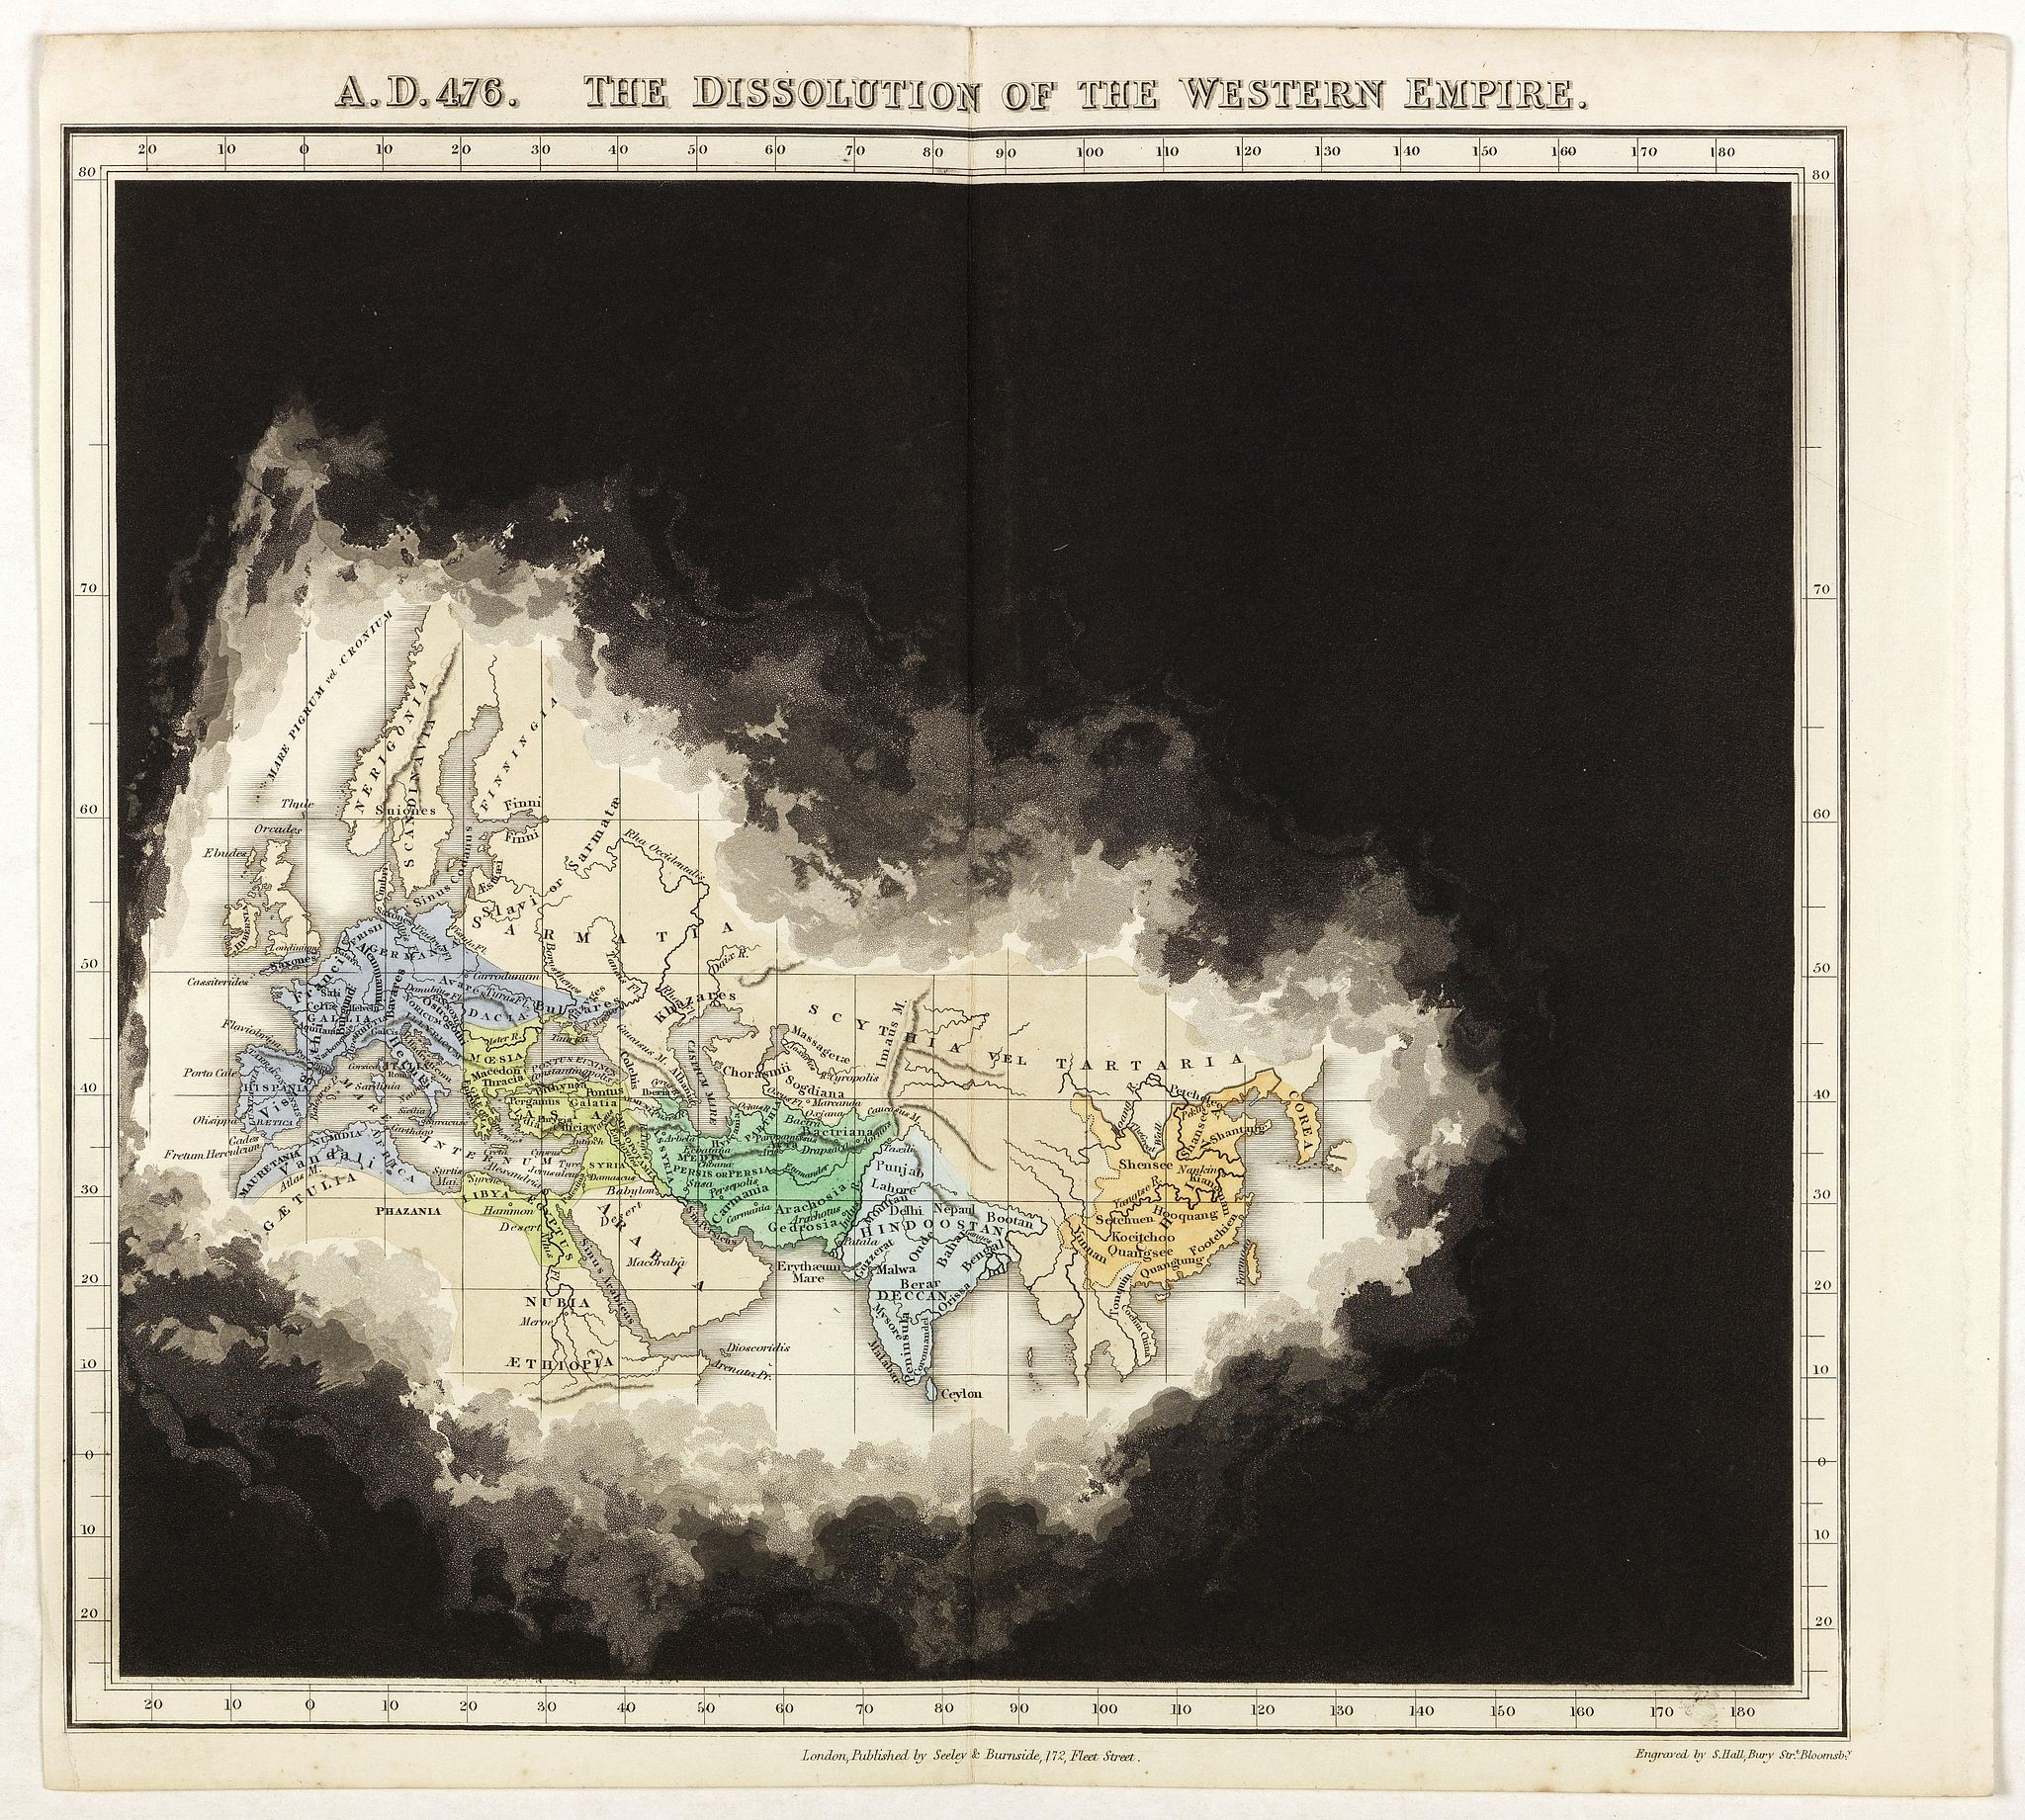 QUIN, E. -  A.D. 476. The dissolution of the Western Empire.